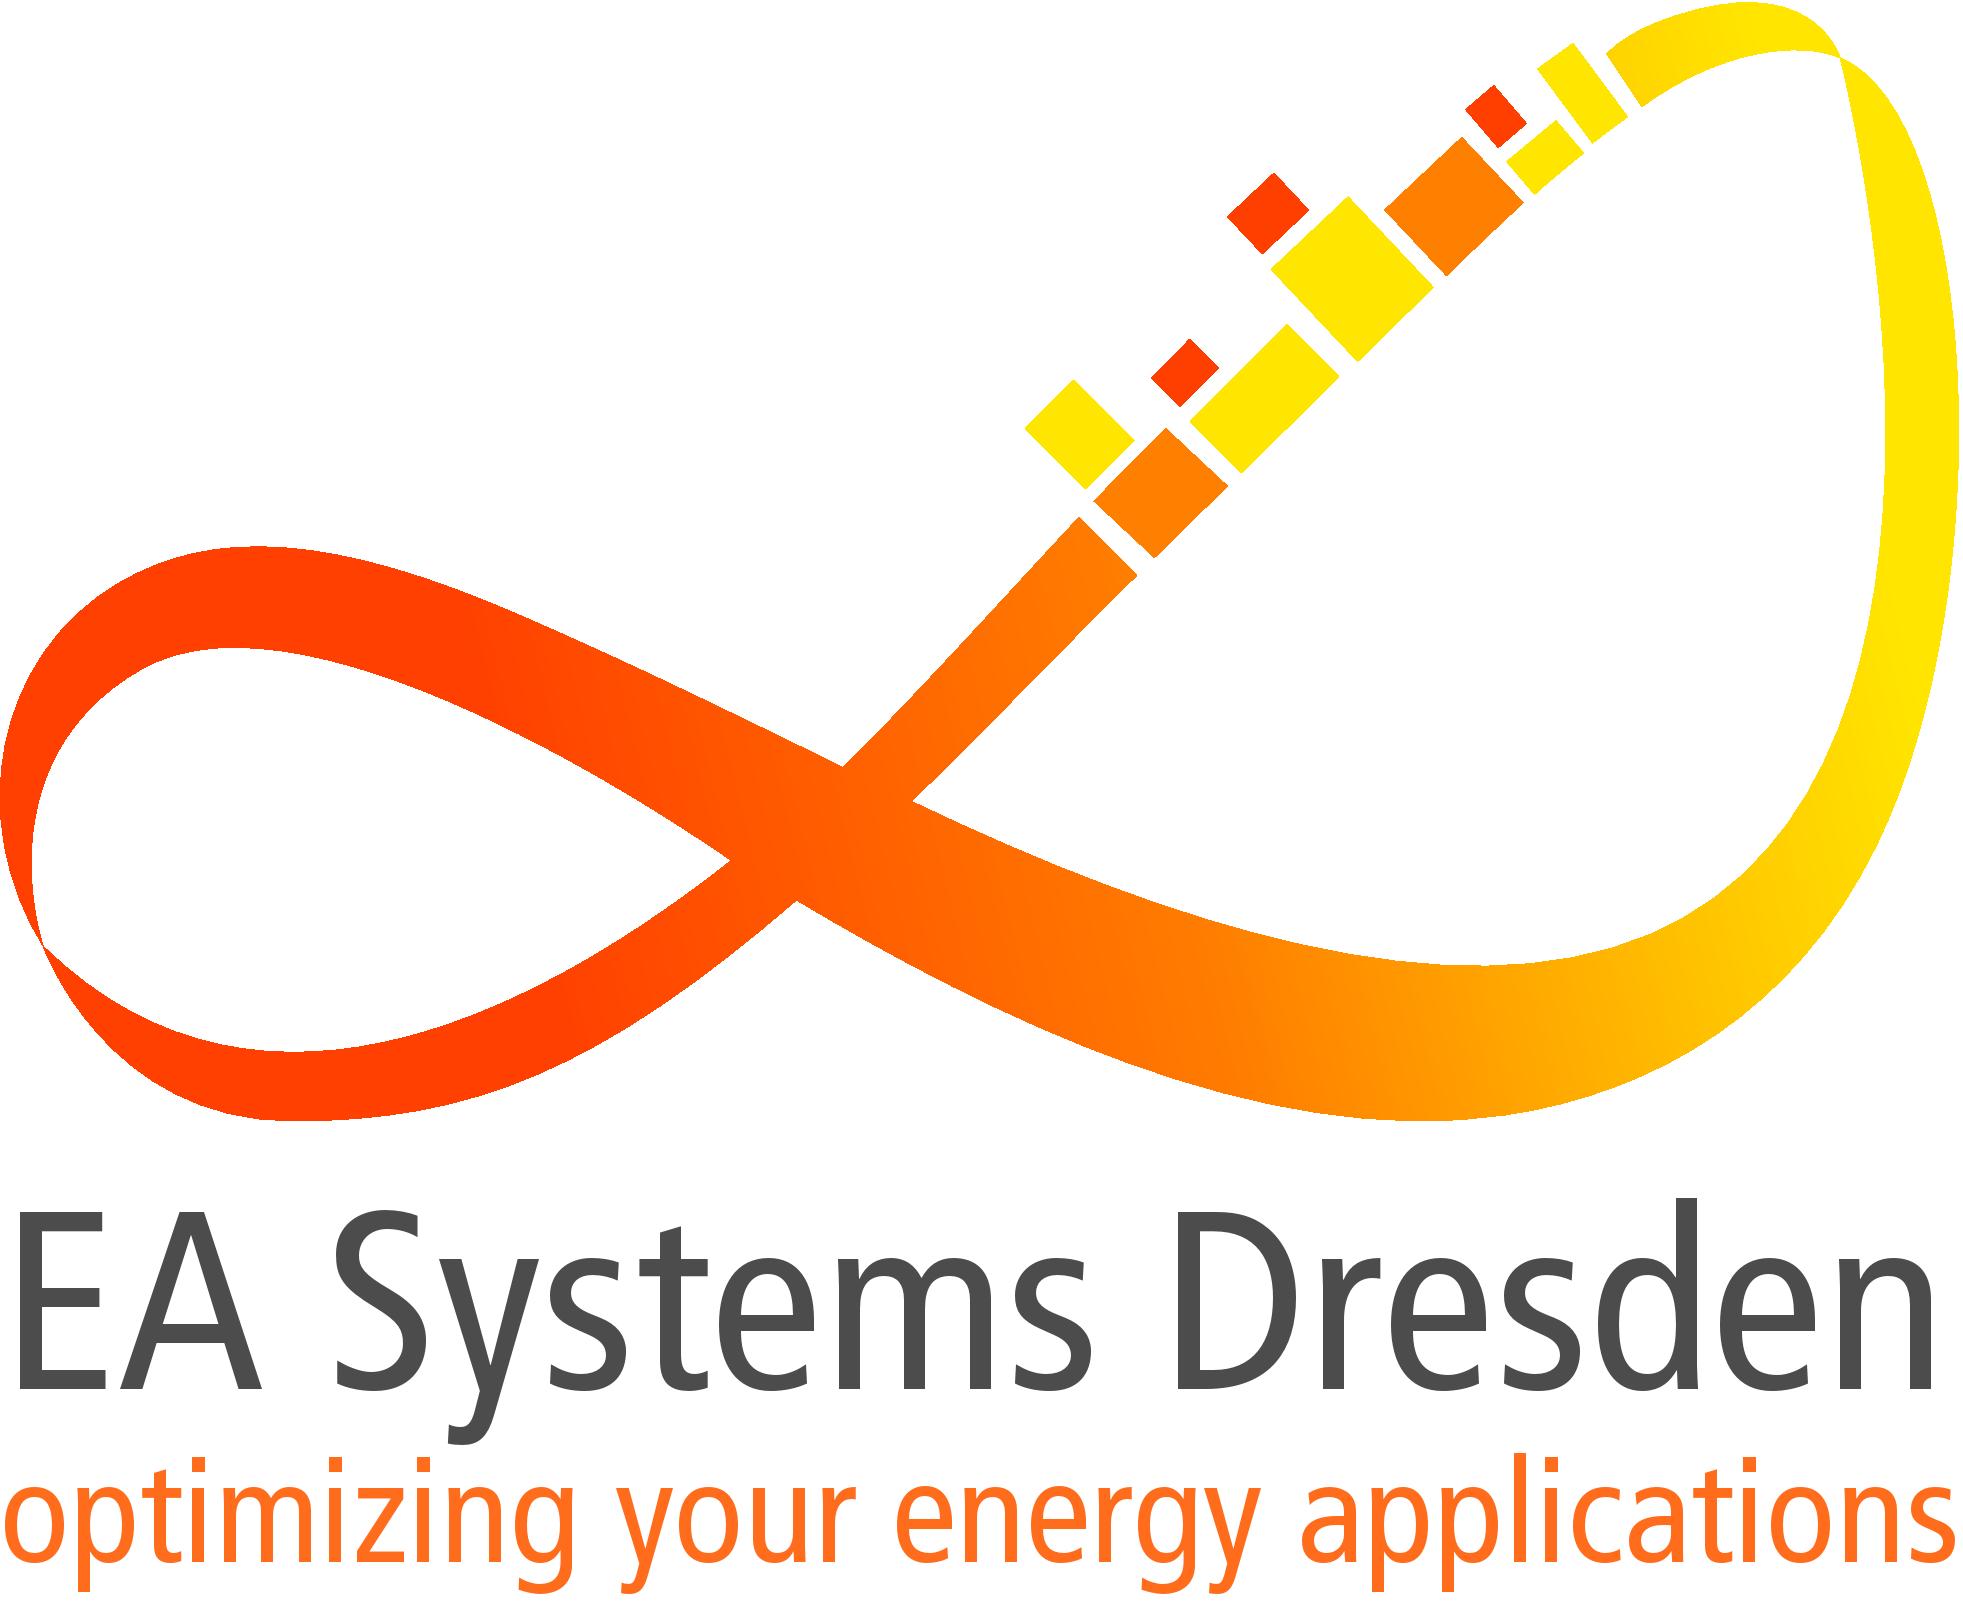 EA Systems Dresden